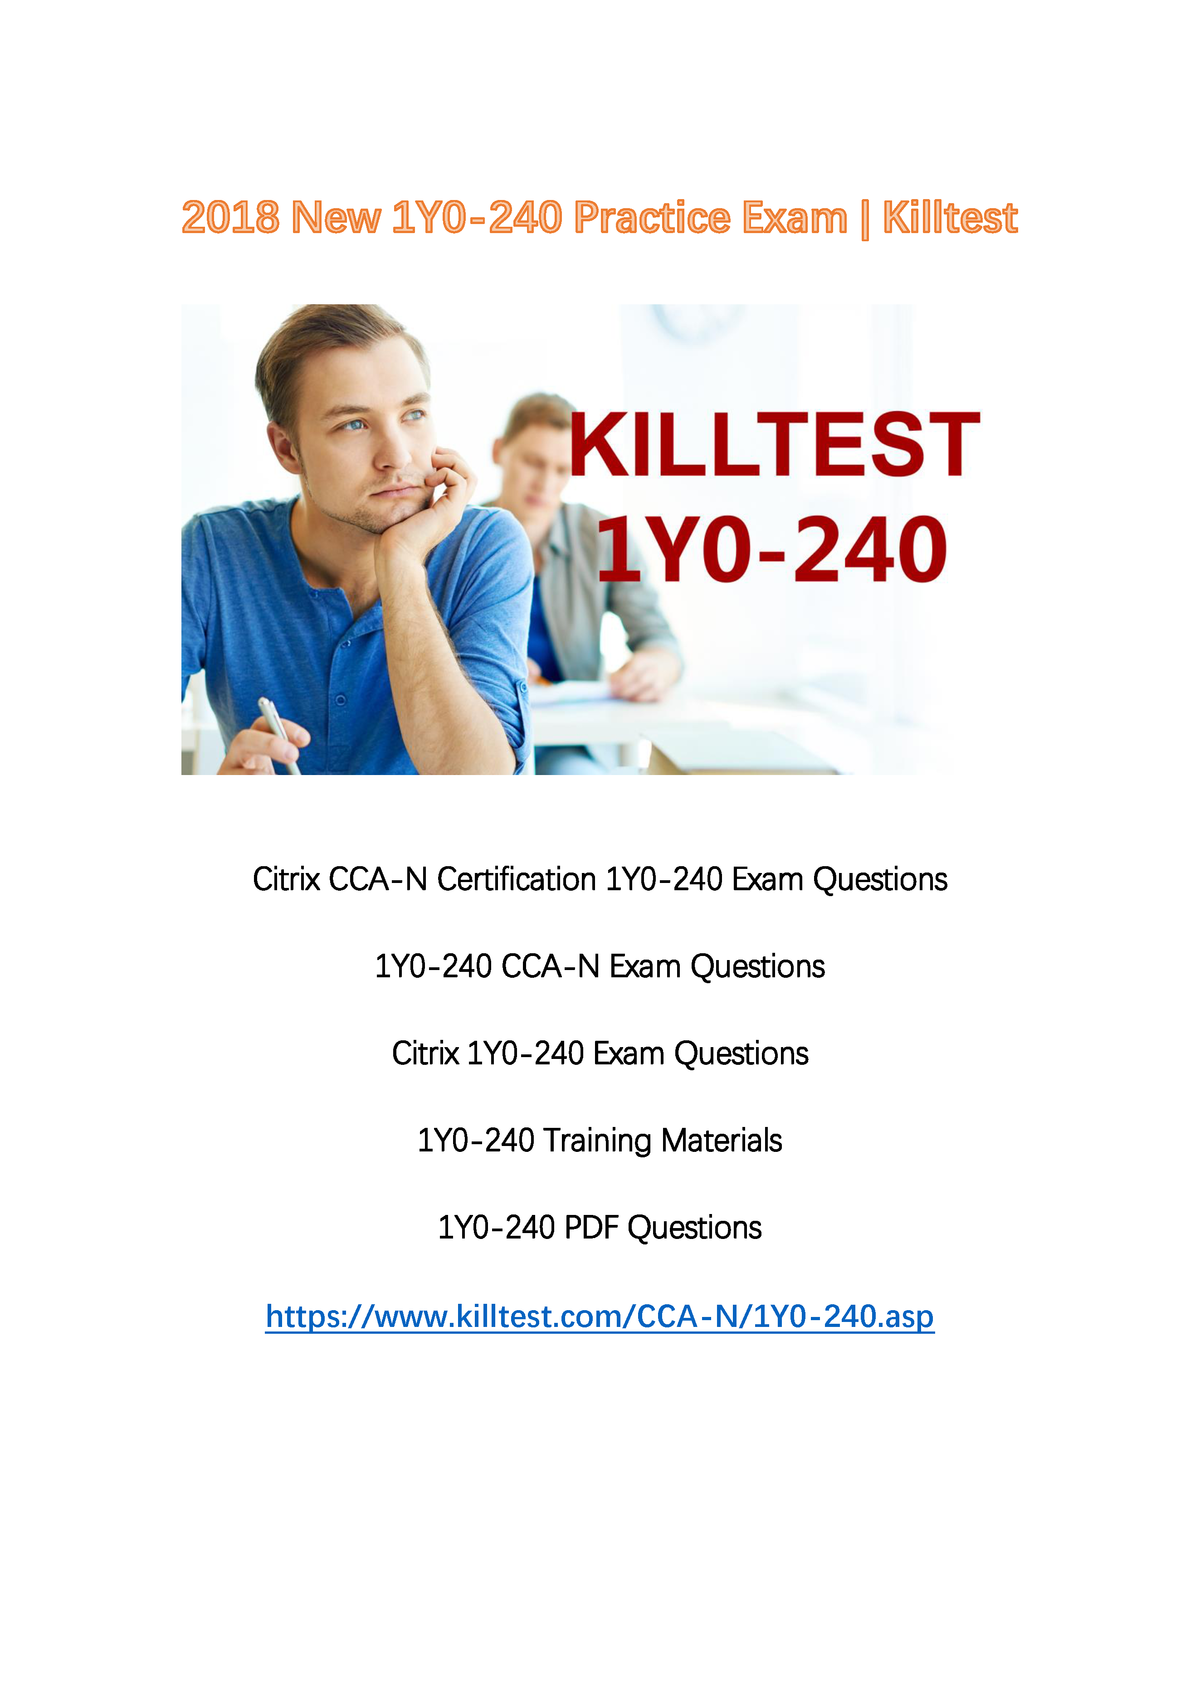 2018 New 1Y0-240 Exam Questions Killtest - 1Y0-240: Citrix